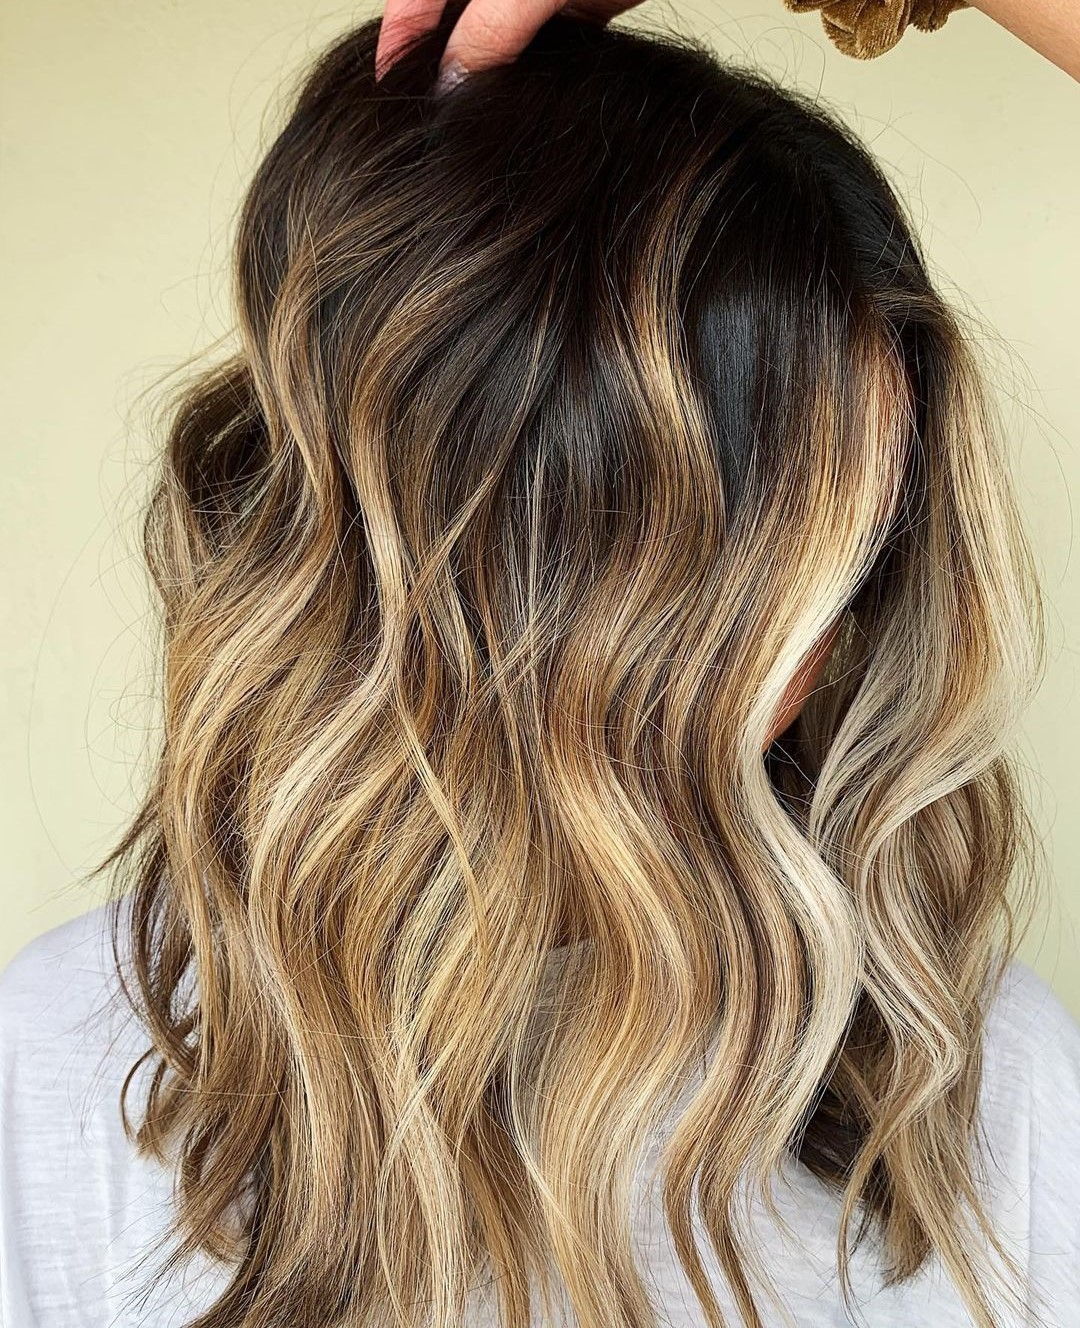 Honey Blonde Hair with Dark Roots